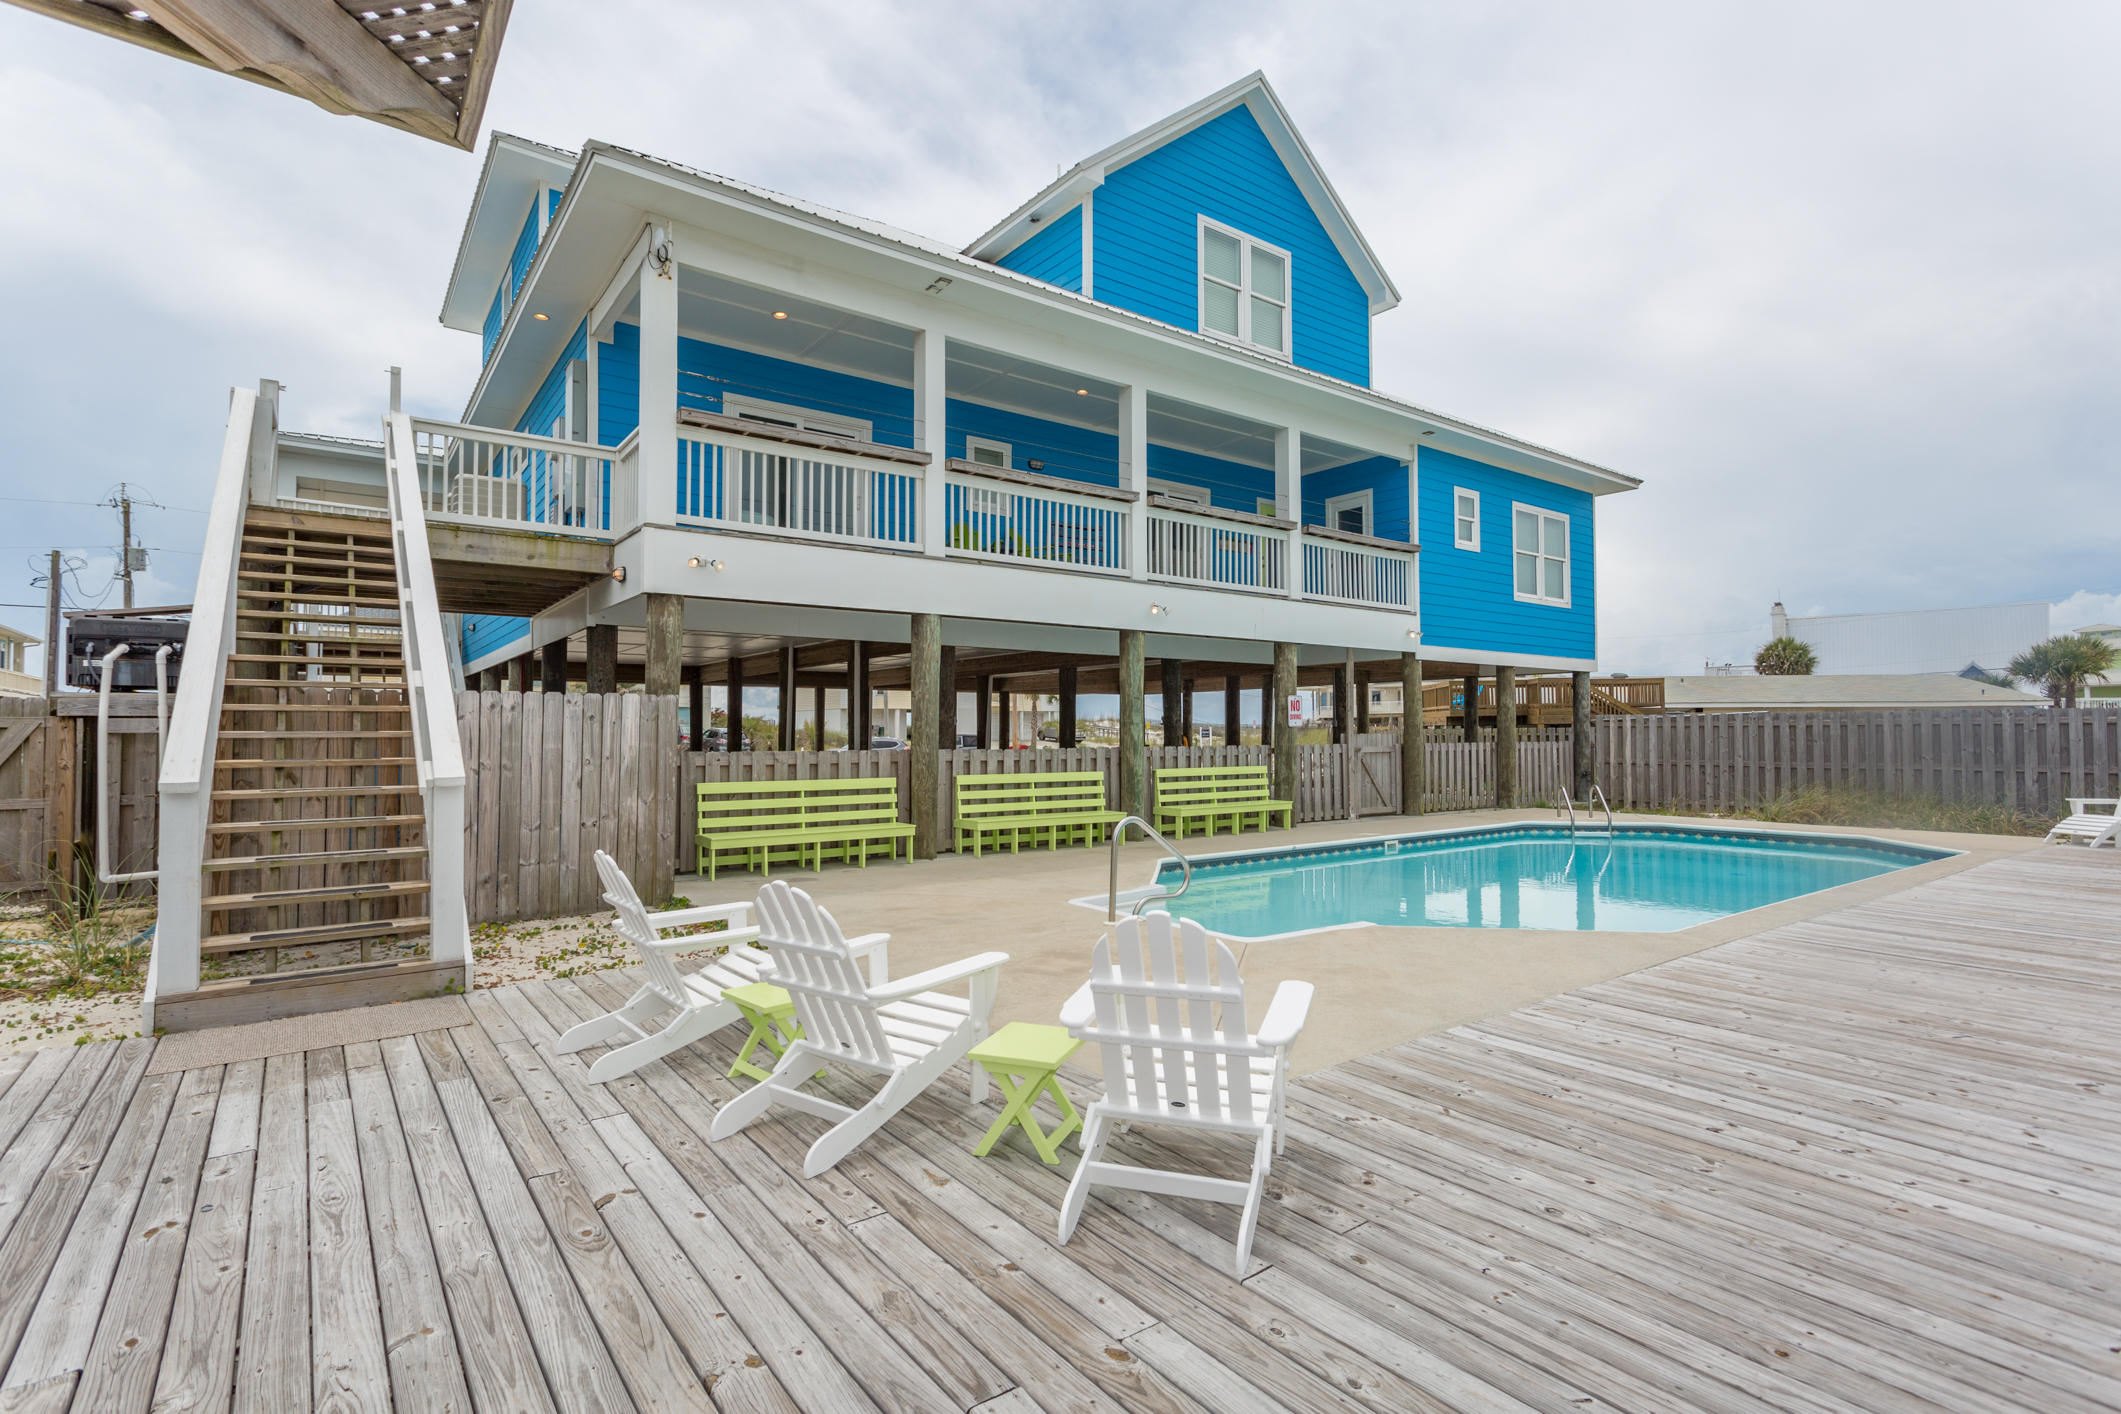 Ariola 1003 - The Starfish House House/Cottage rental in Pensacola Beach House Rentals in Pensacola Beach Florida - #73